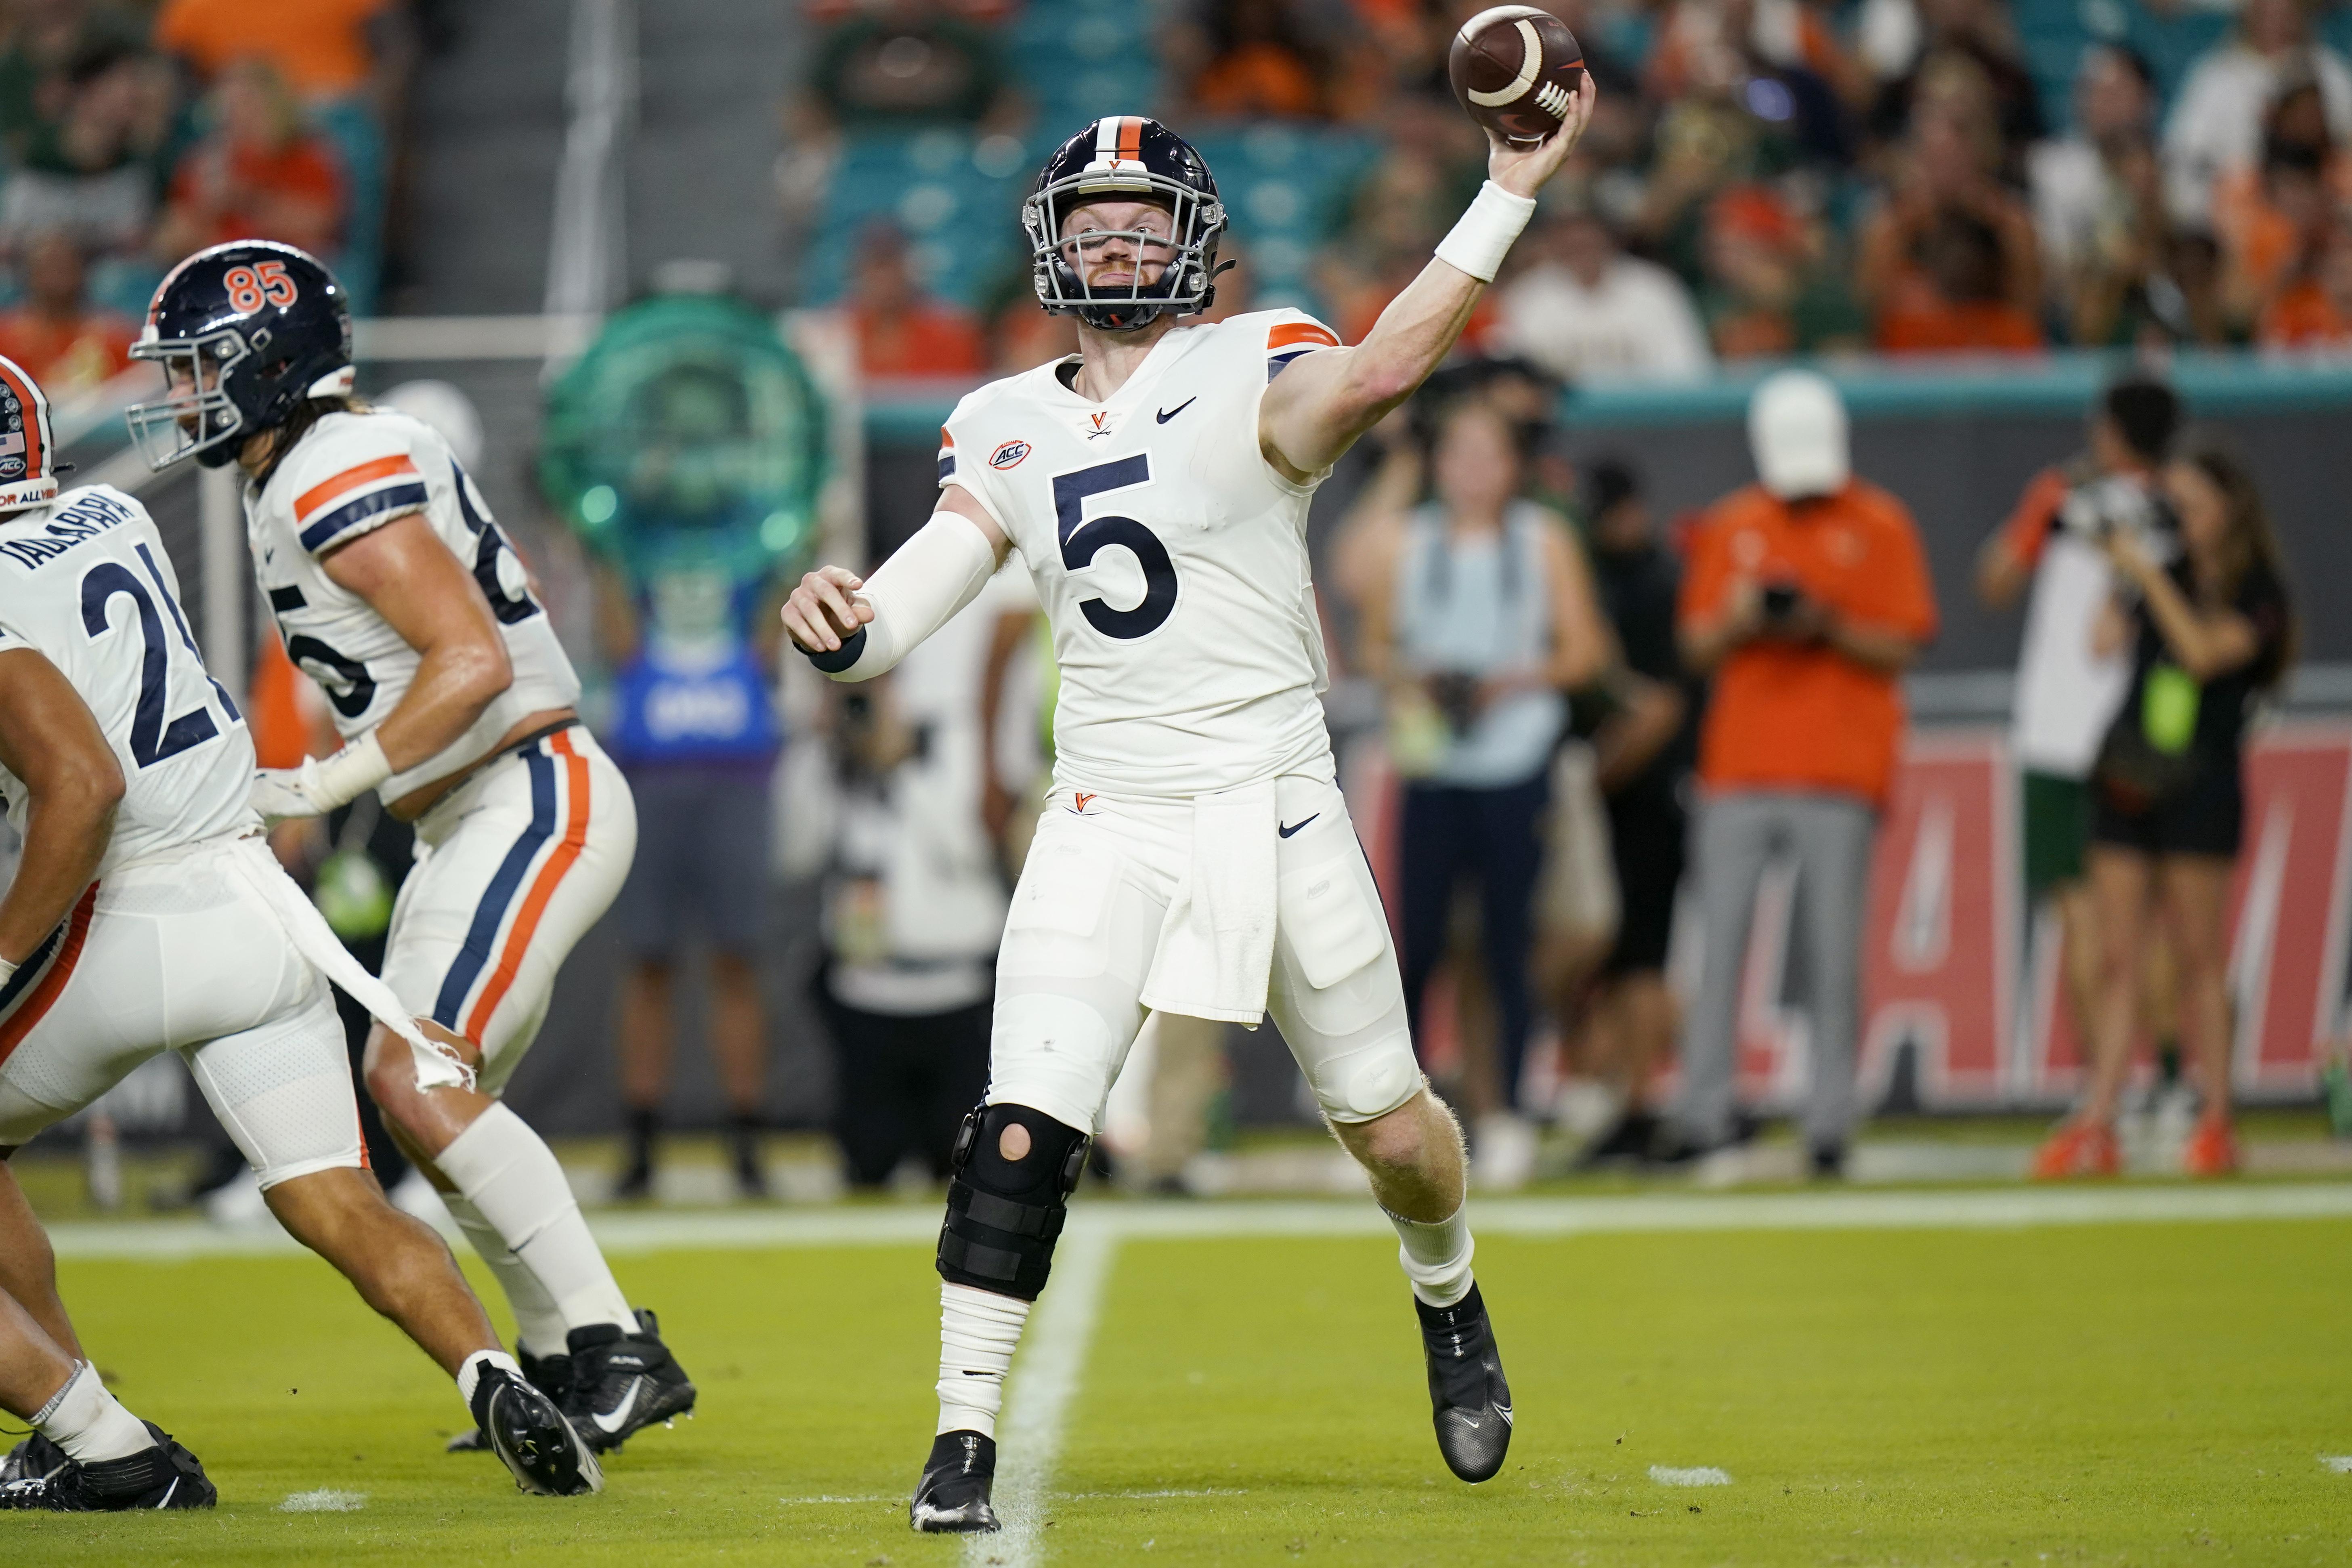 Virginia quarterback Brennan Armstrong passes during game against Miami, Thursday, Sept. 30, 2021, in Miami Gardens, Fla.